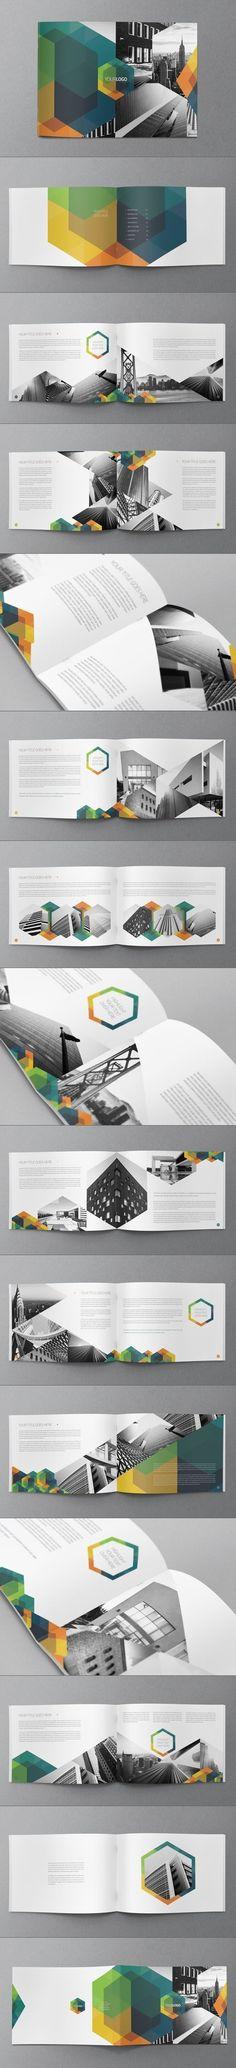 Hexo Brochure Design by Abra Design   Graphic Design in Catalog